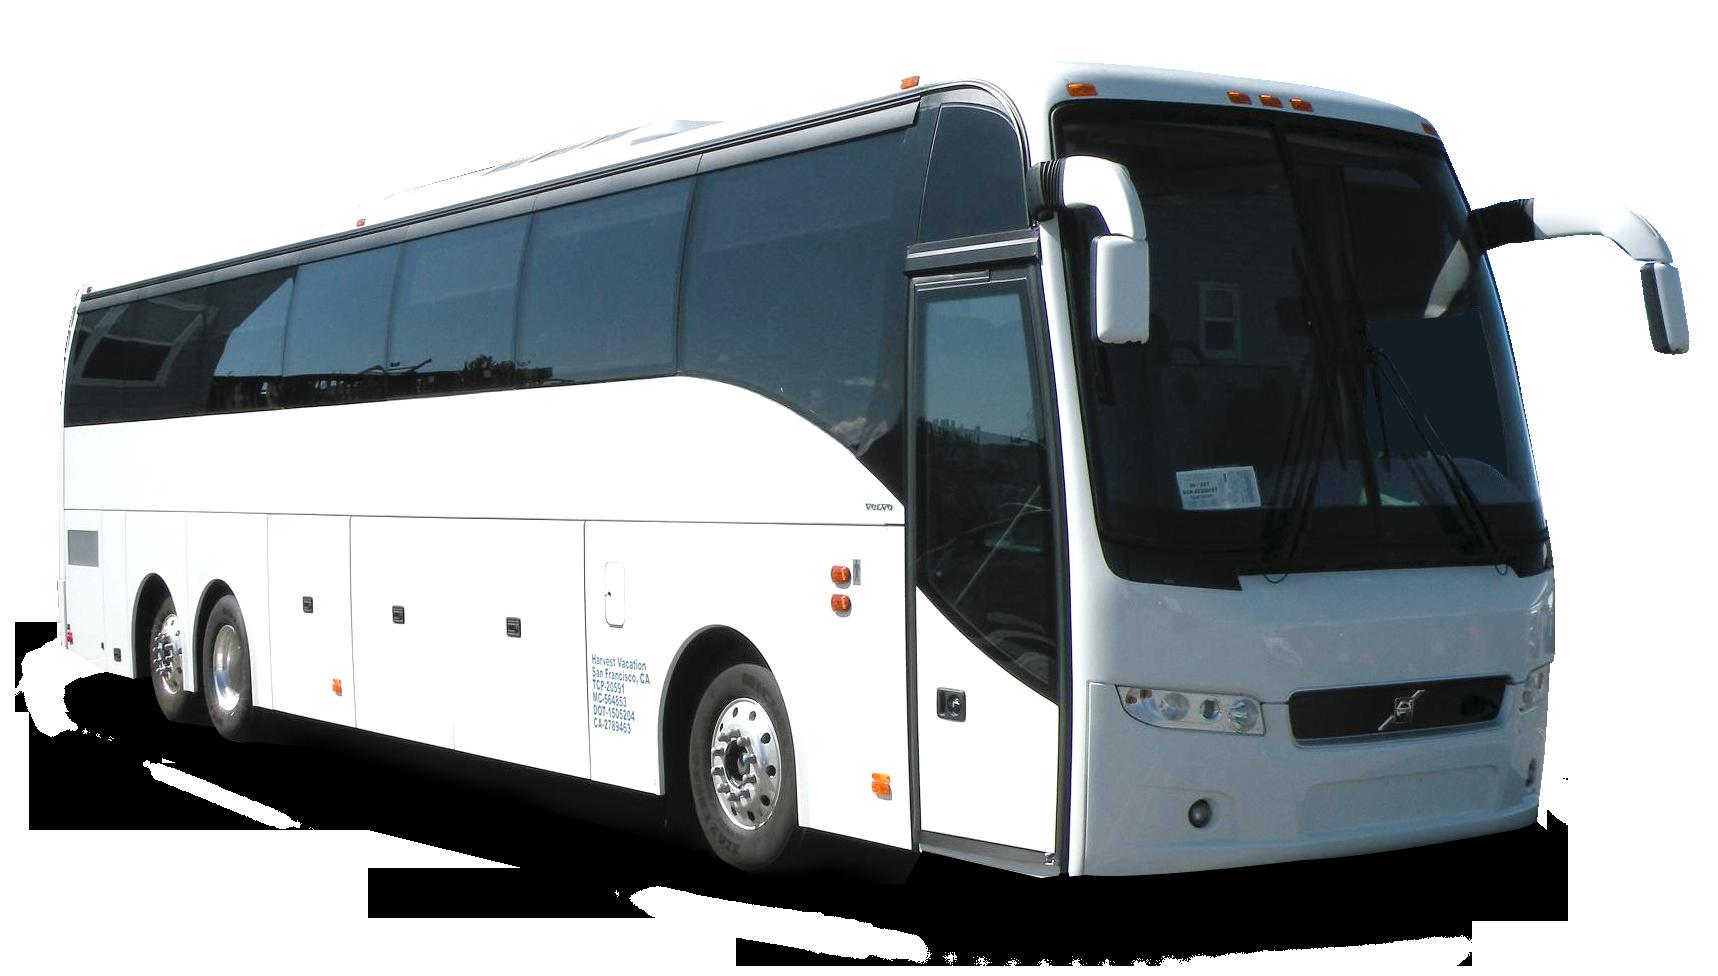 Bus Png Image Purepng Free Transparent Cc0 Png Image